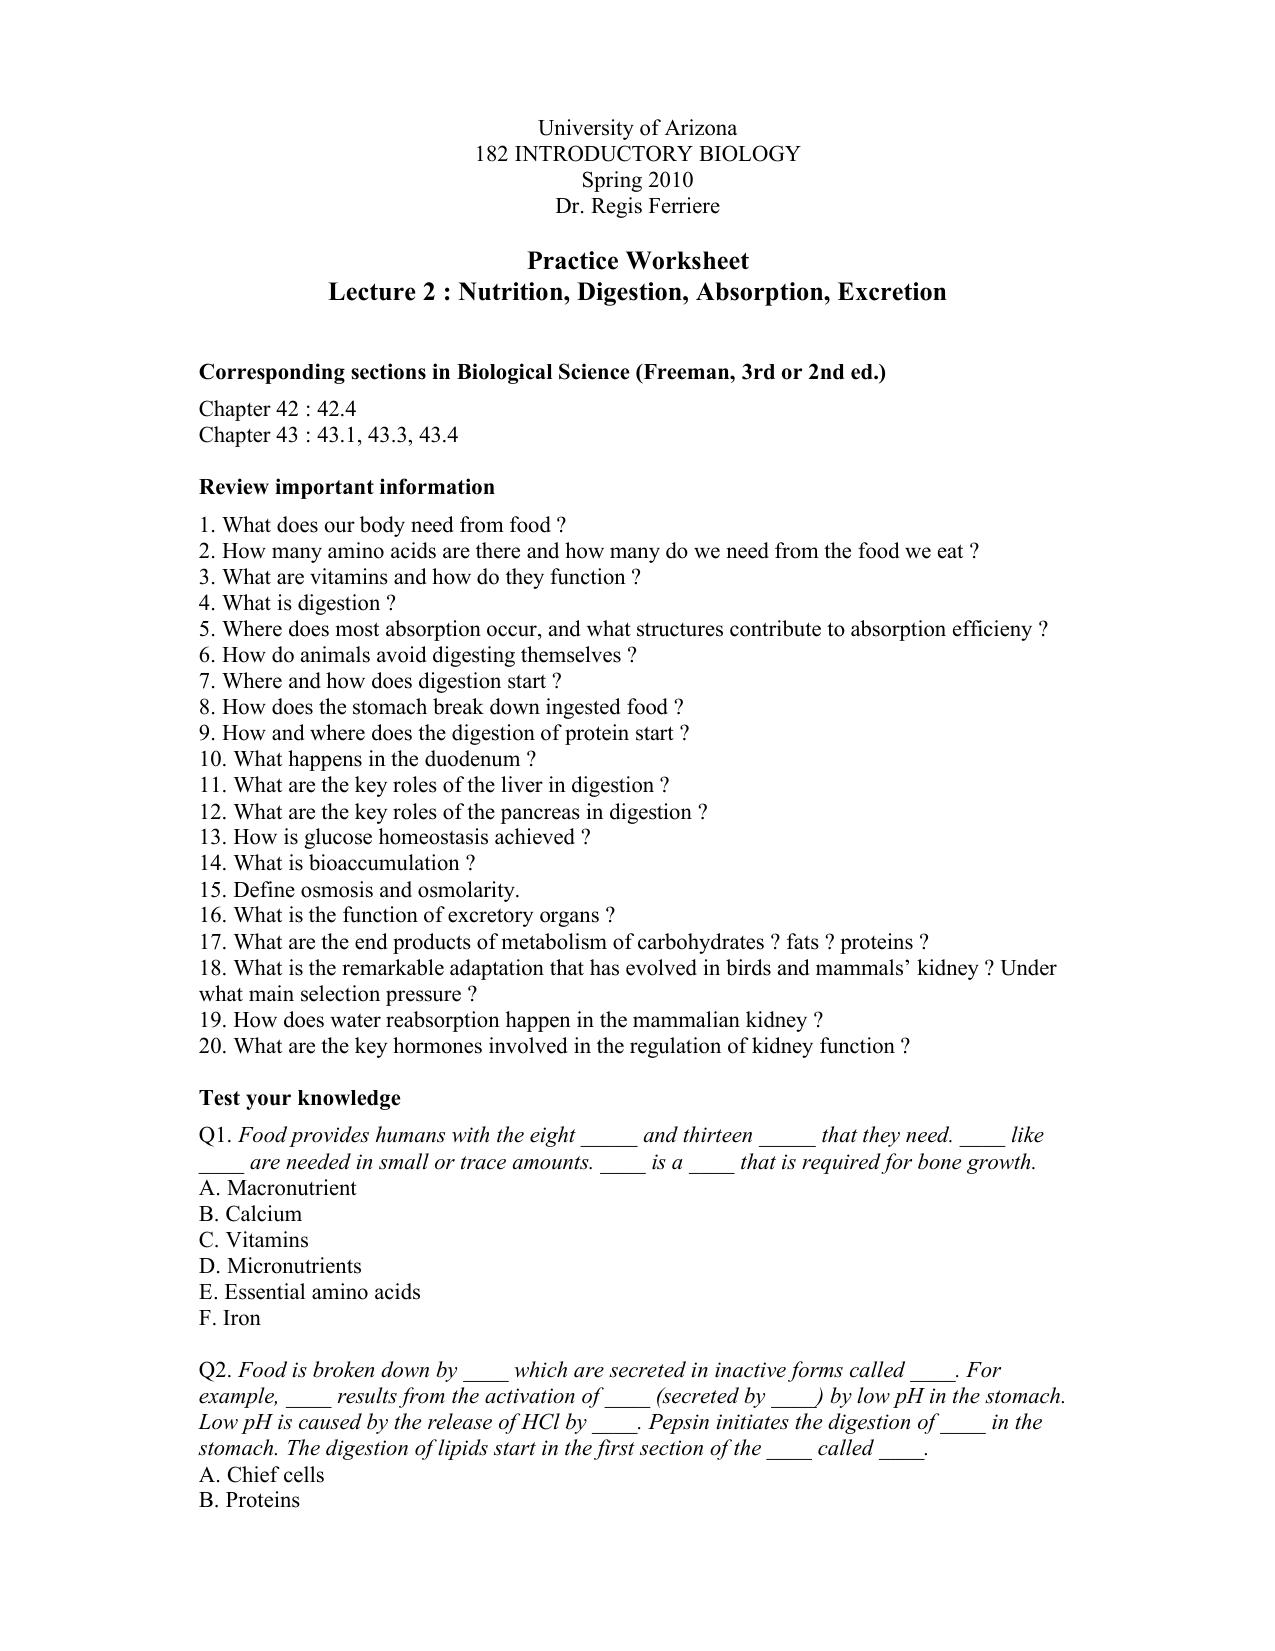 Kidney Questions Worksheet